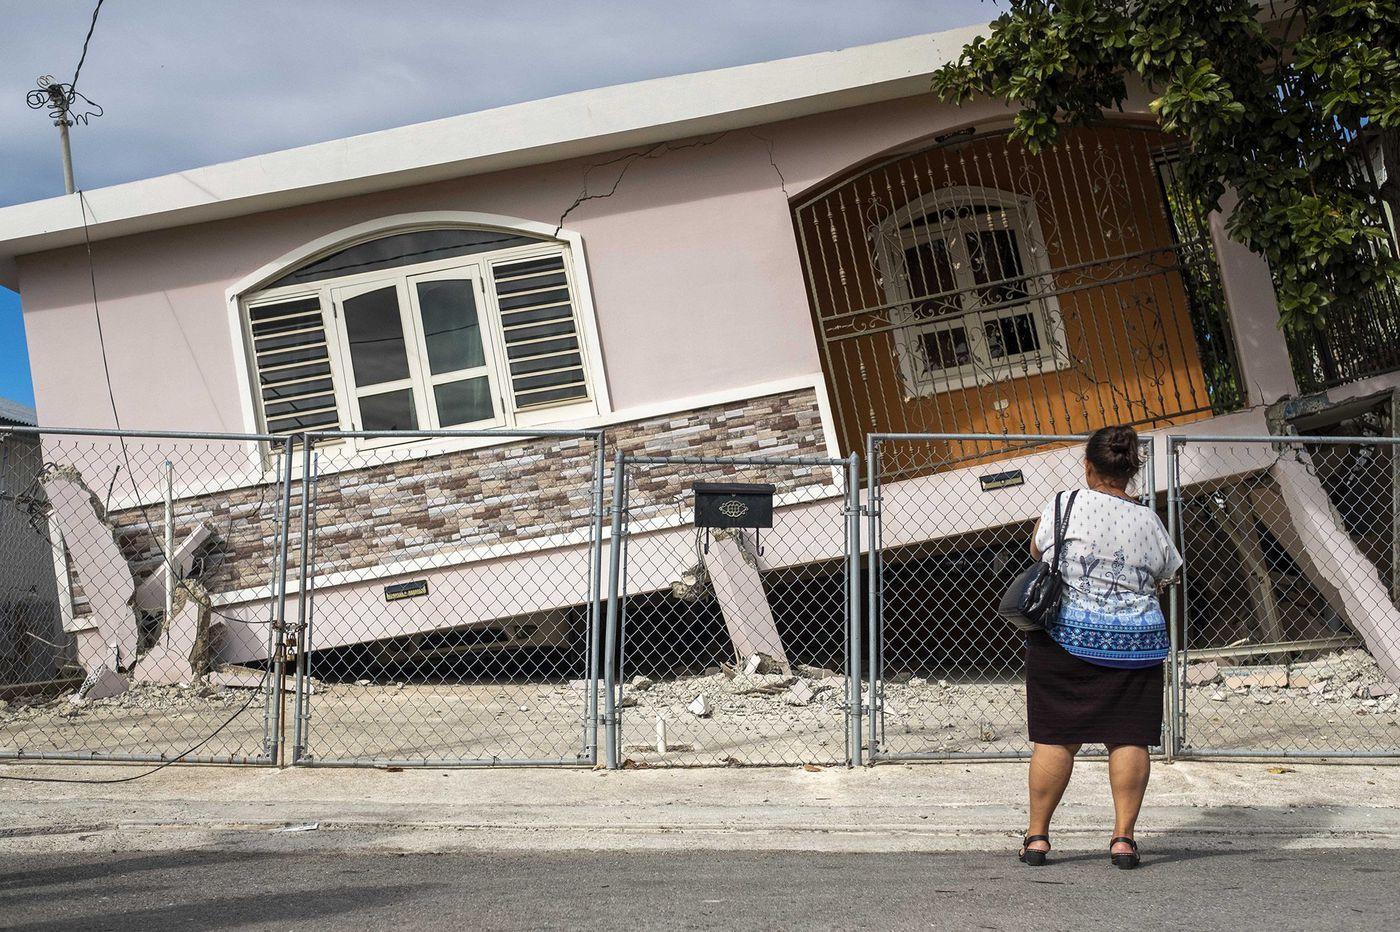 Puerto Rico earthquake: How to help